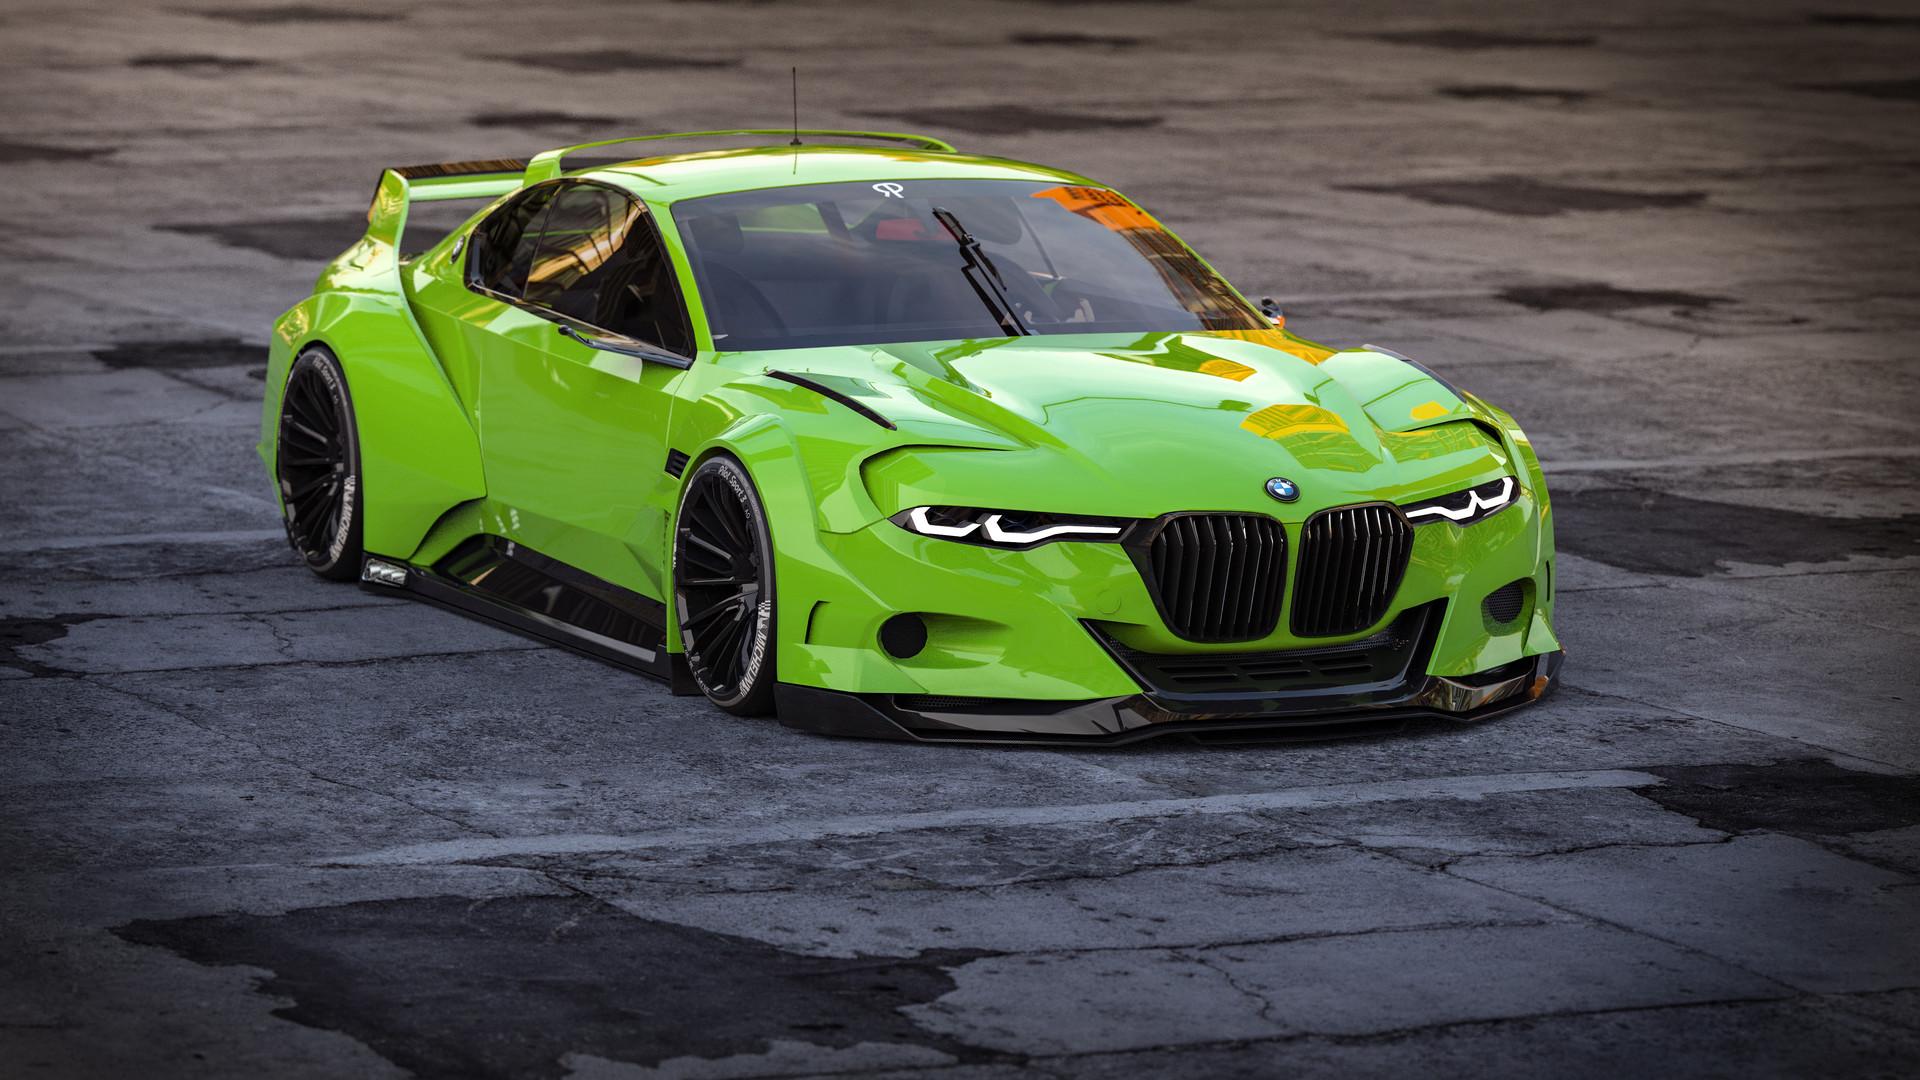 BMW 3.0 Csl >> ArtStation - BMW 3.0 CSL Hommage R Bodykit vol. III, Rostislav Prokop